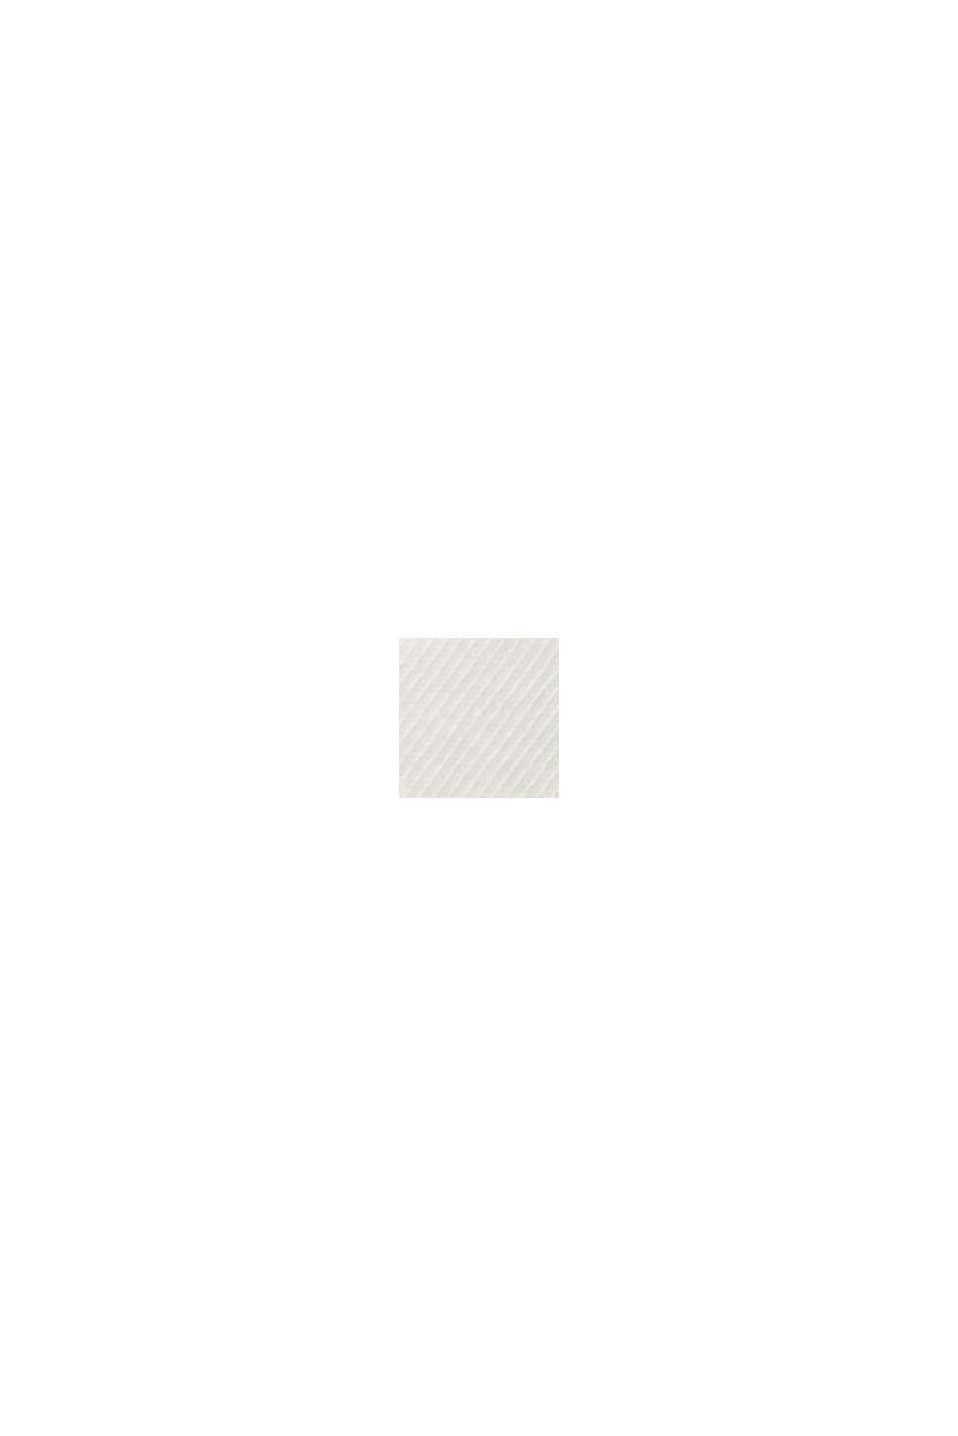 Camiseta con estampado de algodón ecológico, OFF WHITE, swatch